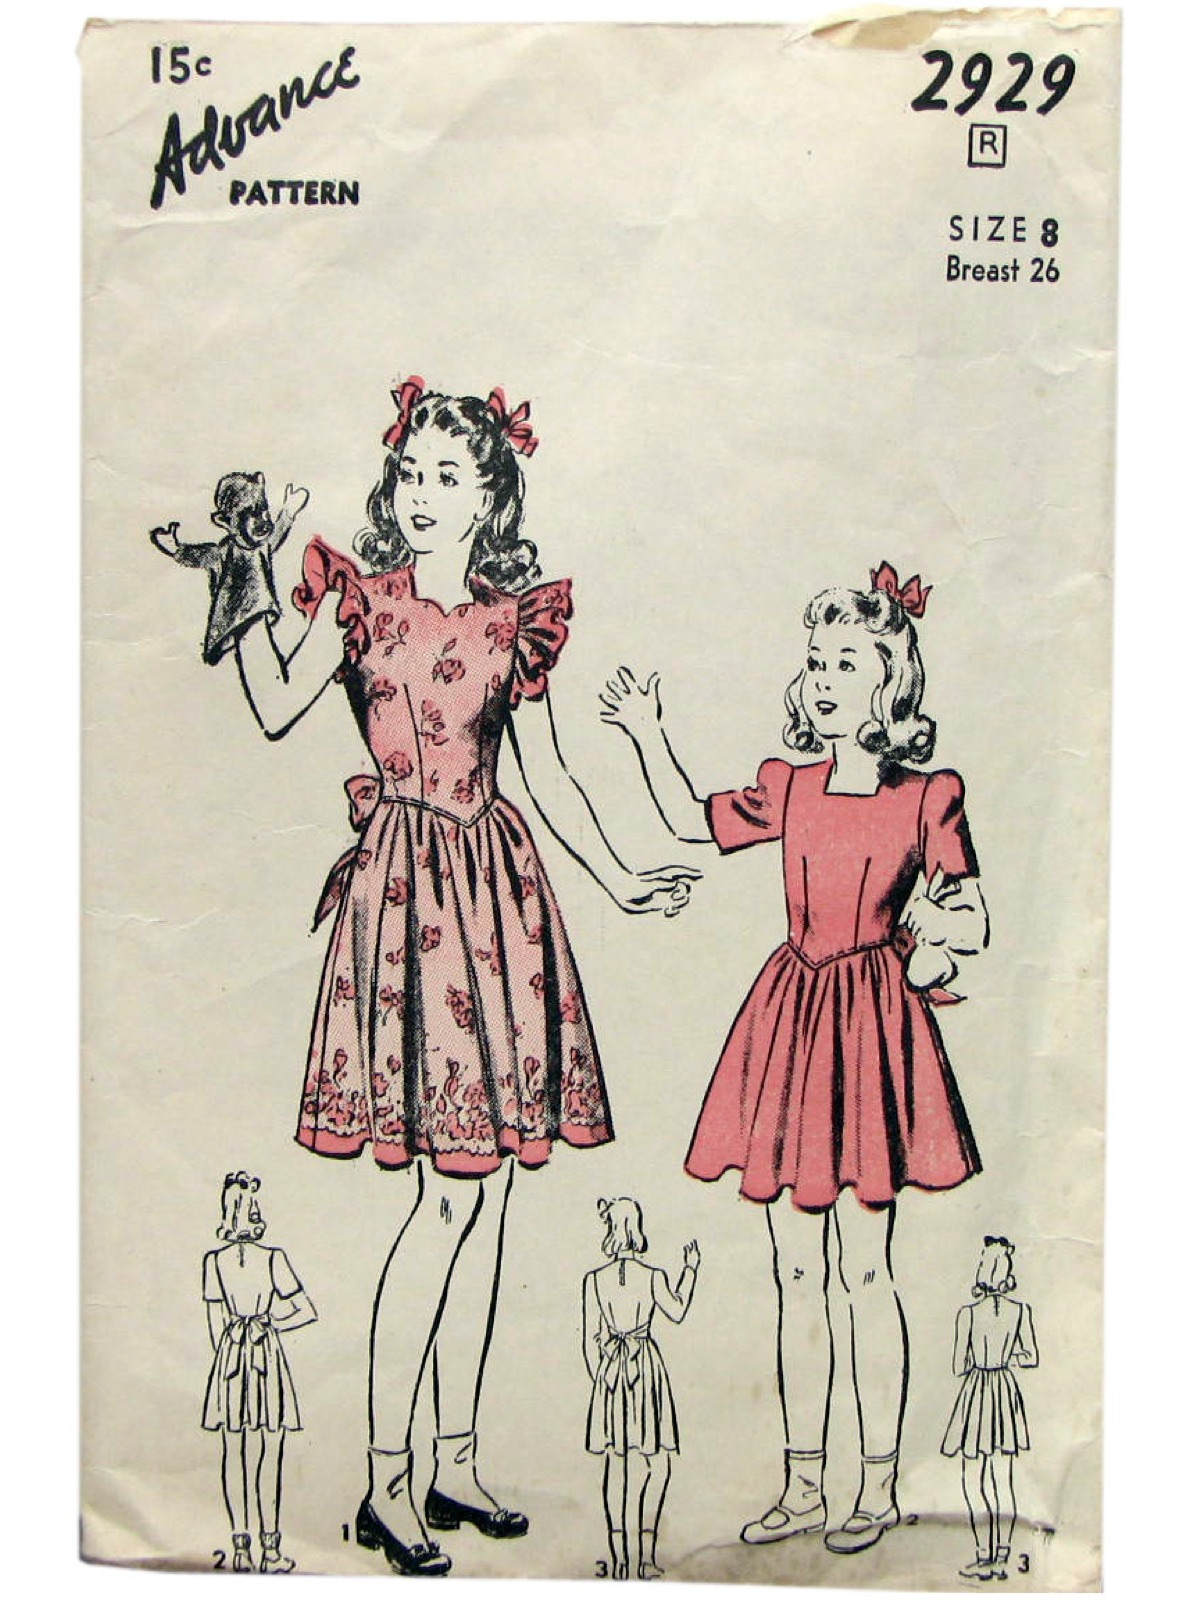 40s Vintage Advance Pattern No. 4906 Sewing Pattern: 40s